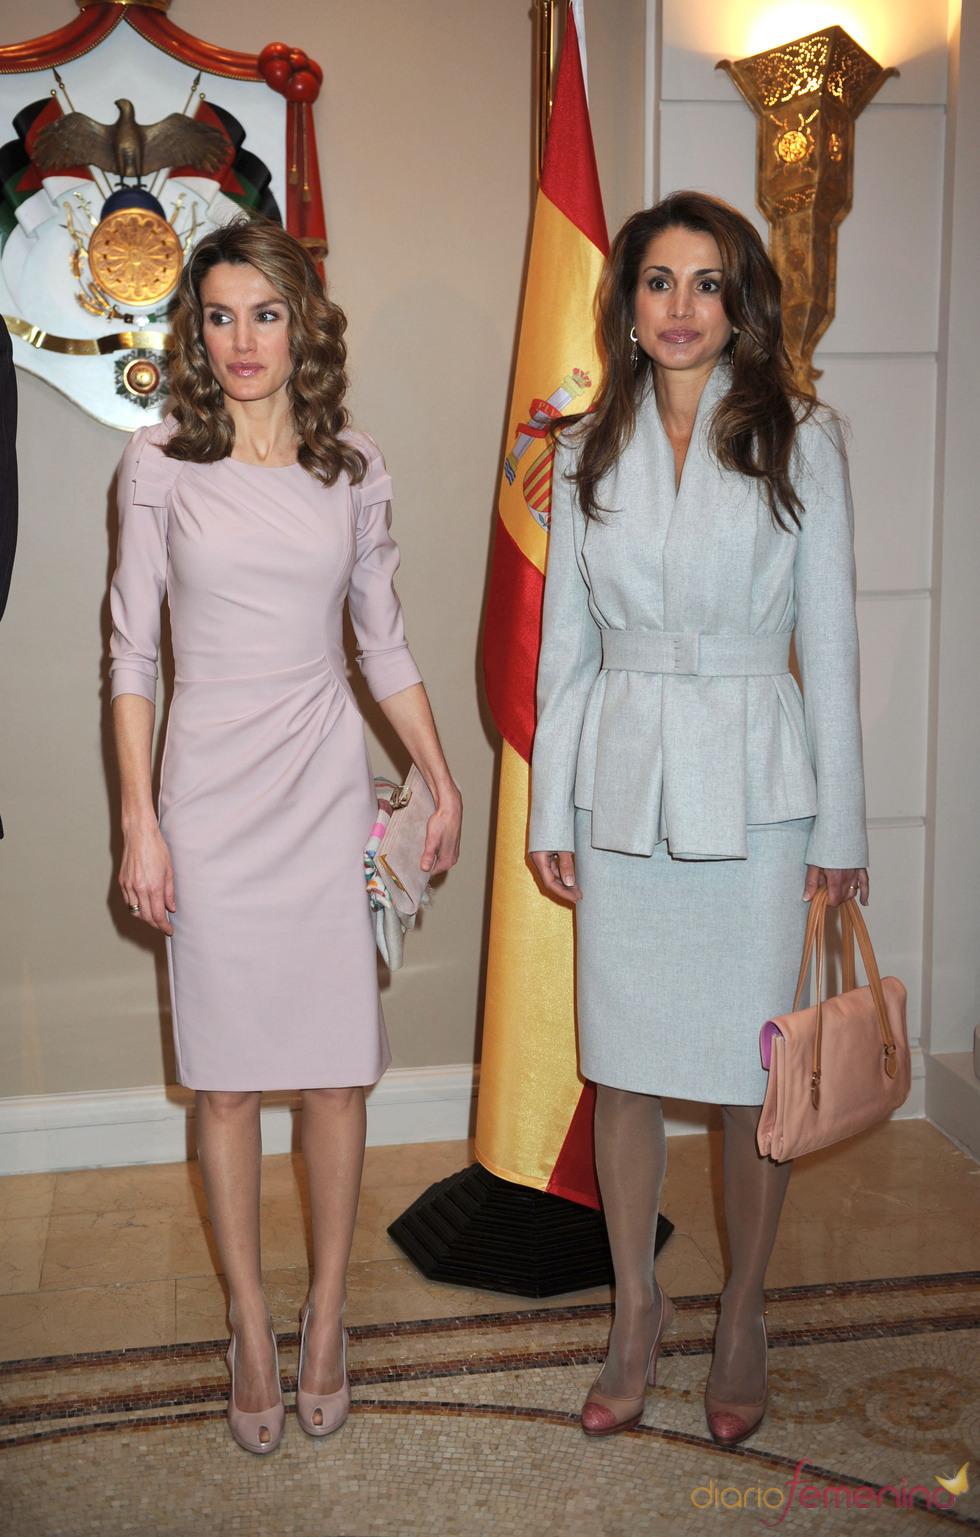 La elegancia de Rania de Jordania y la Princesa Letizia